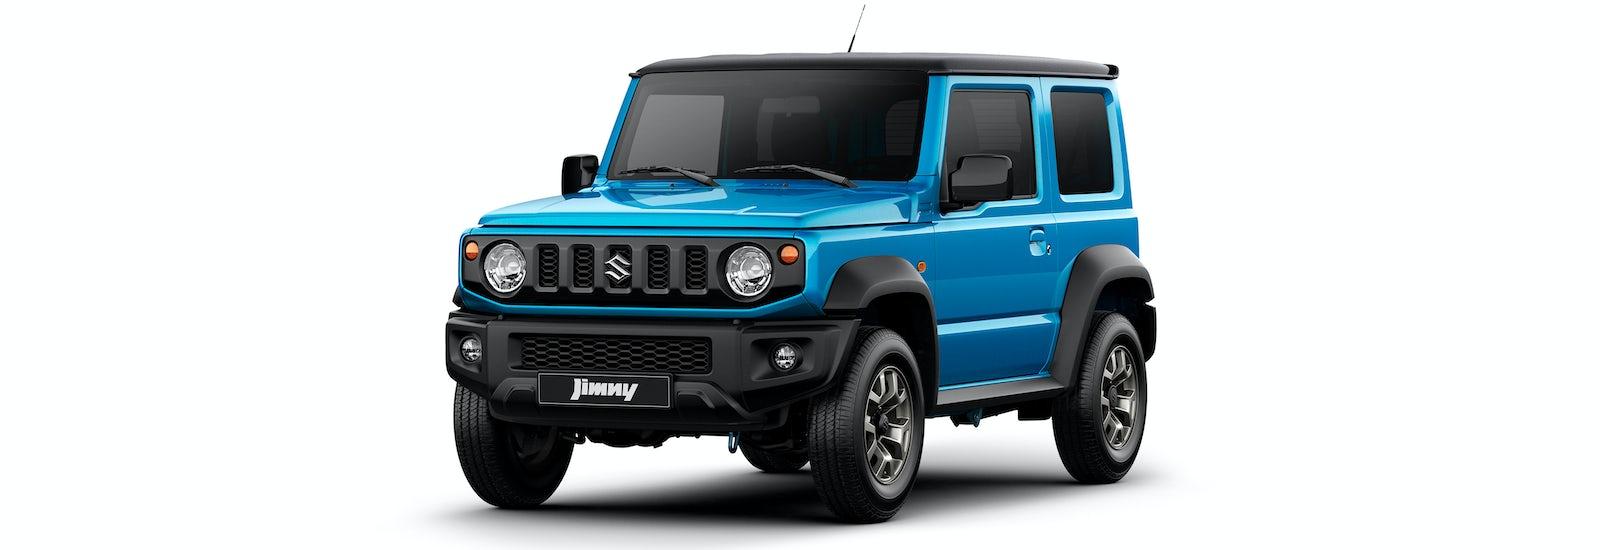 Suzuki Jimny Price Specs And Release Date Carwow